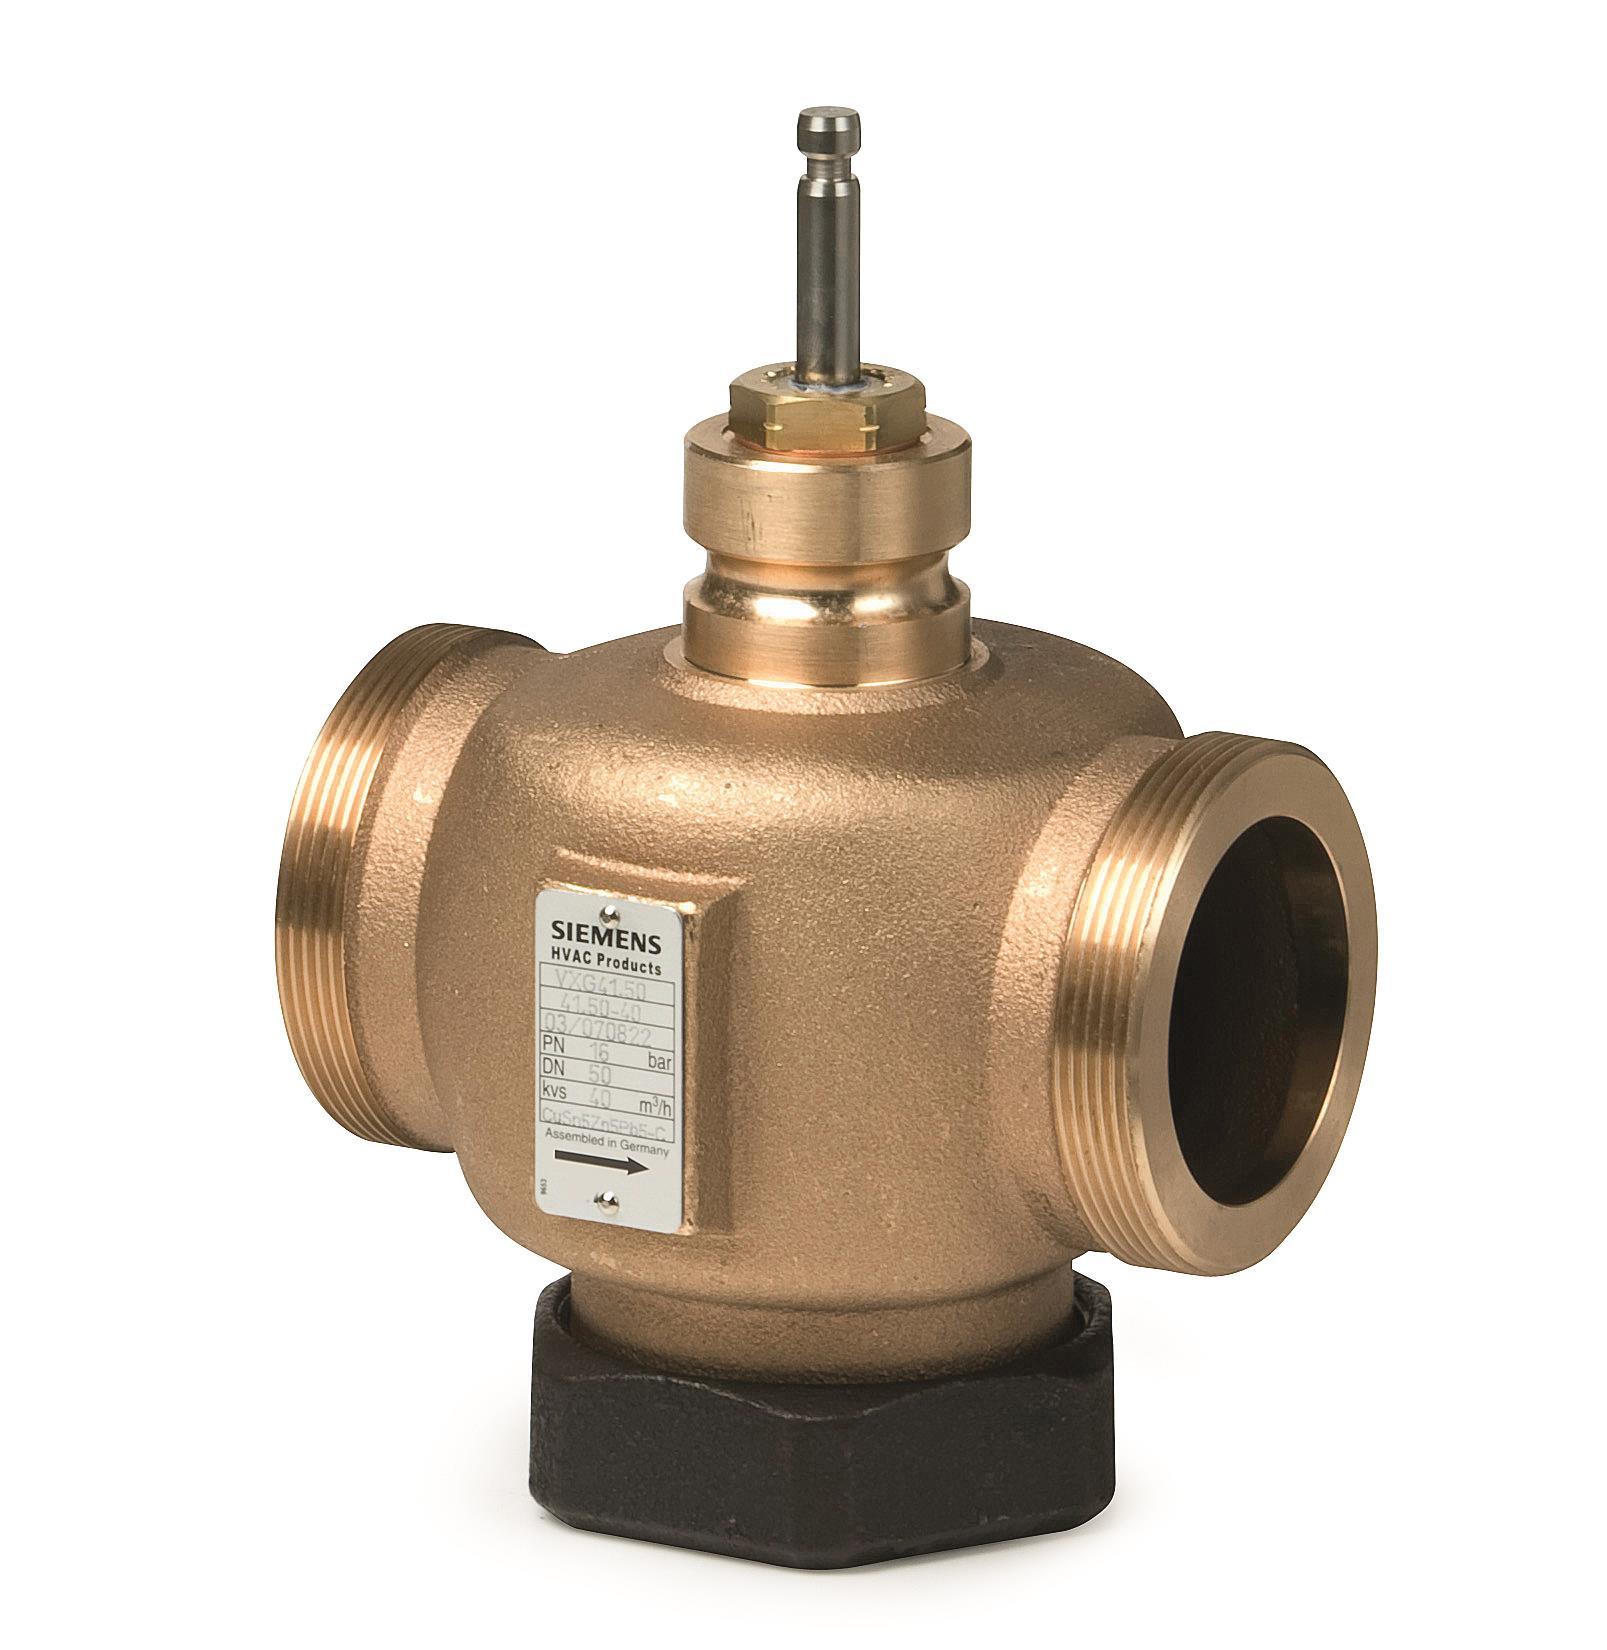 Регулирующий клапан Siemens VVG41 ду 15 VVG41.11